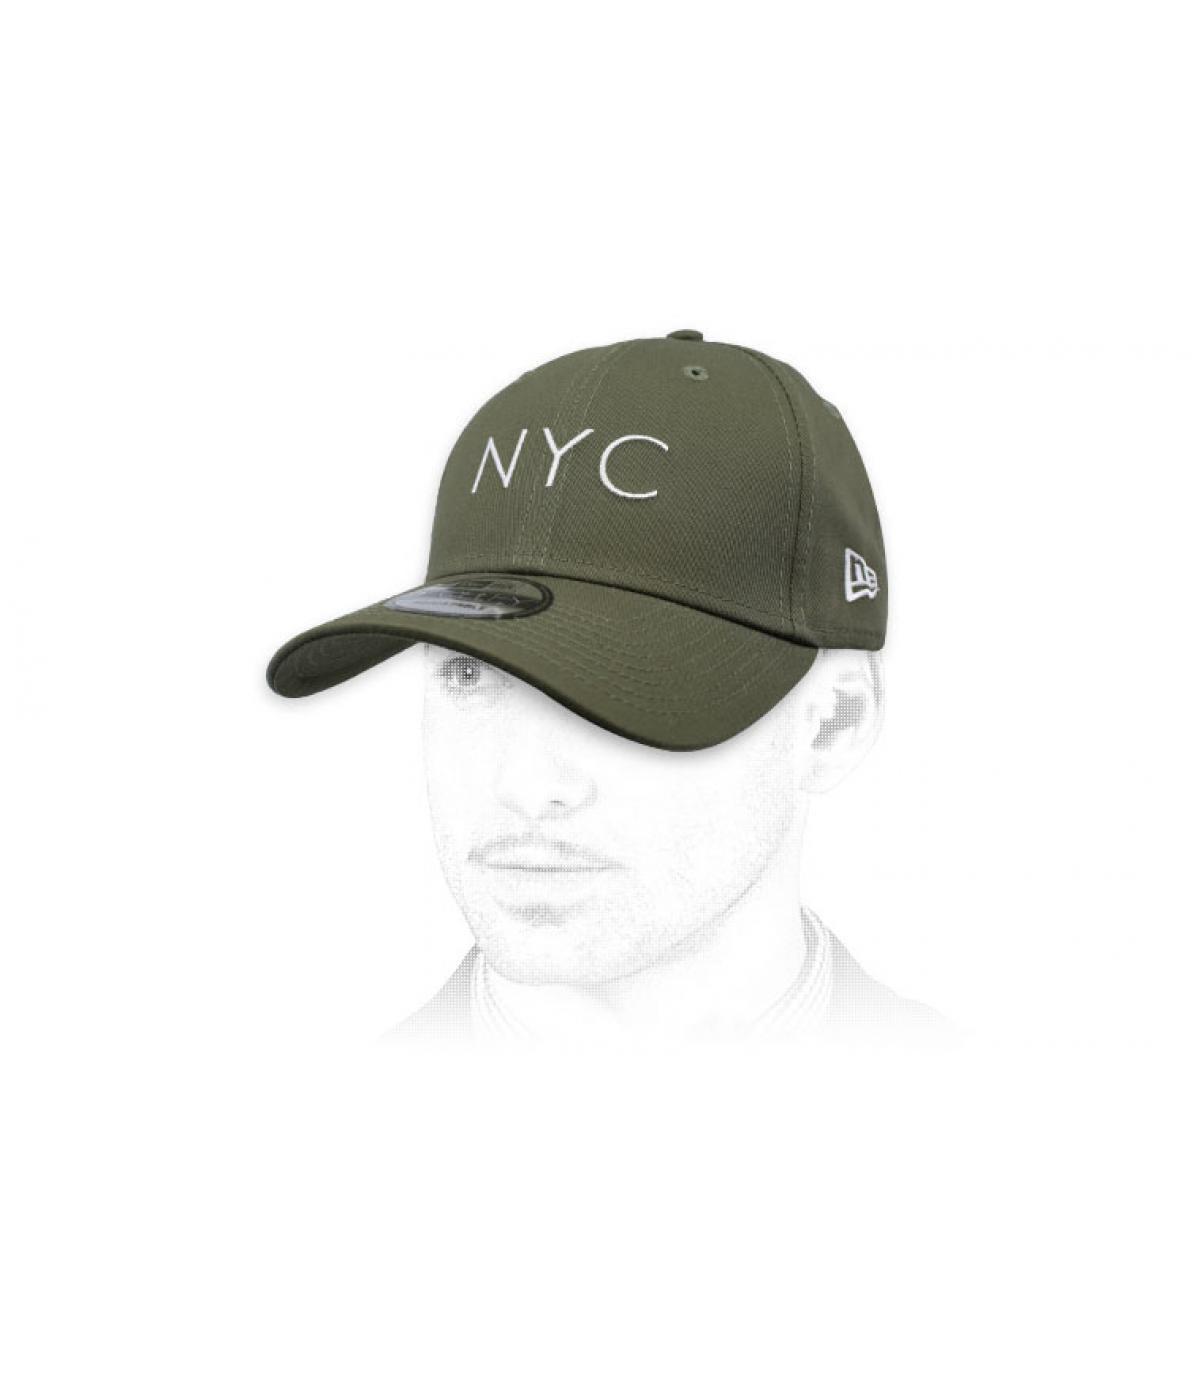 Berretto verde oliva NYC